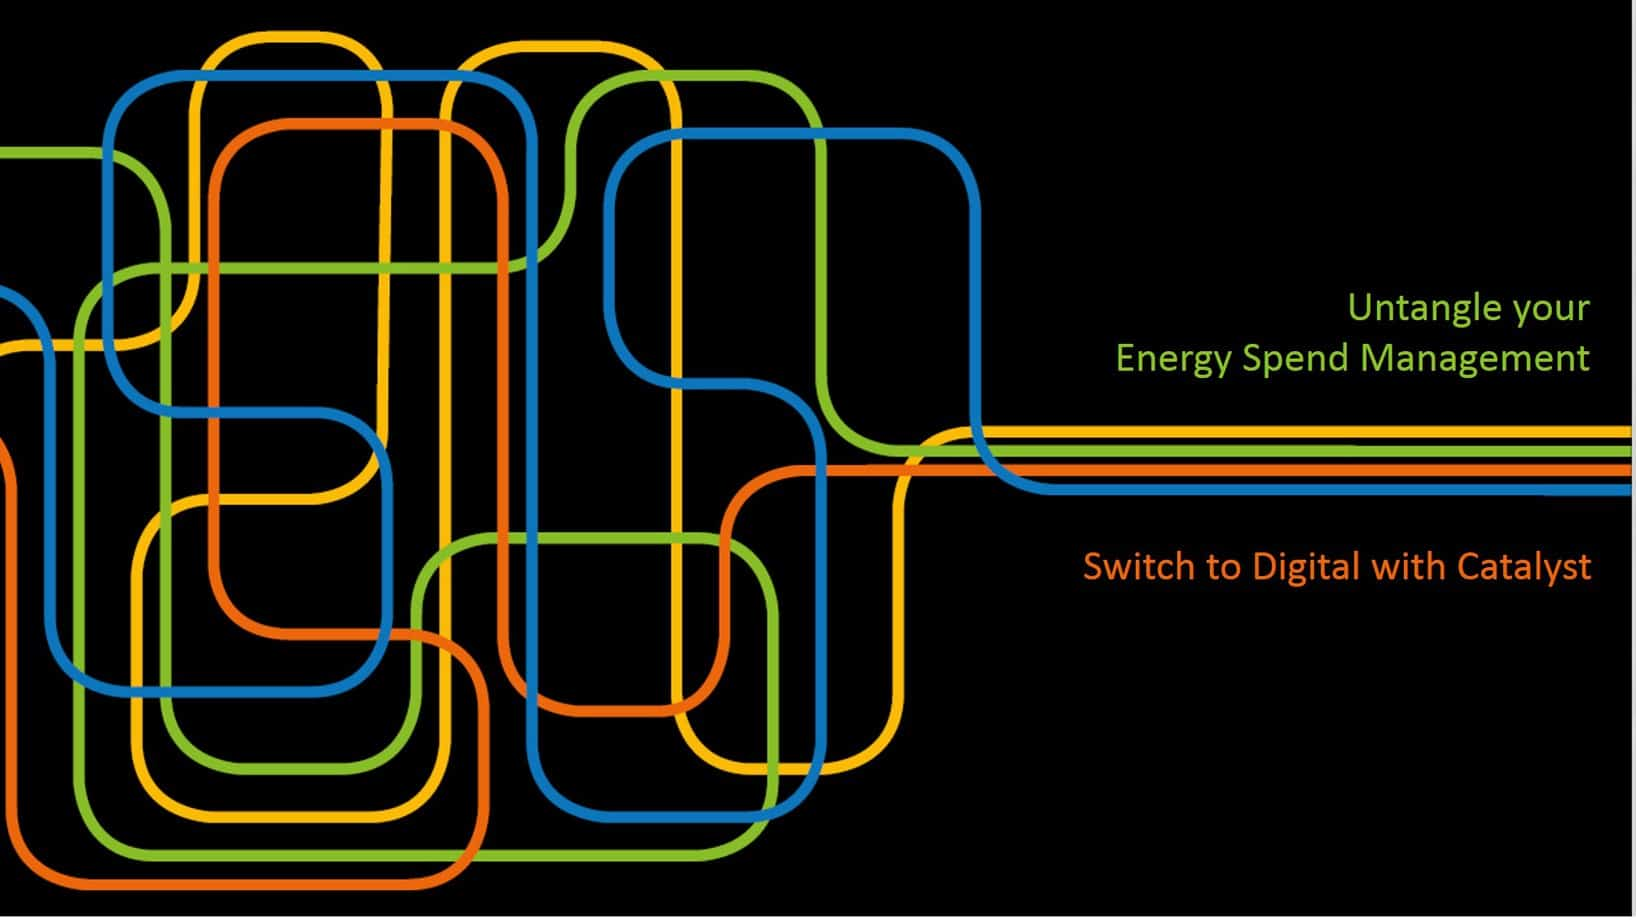 Digital Utilities Lets Go